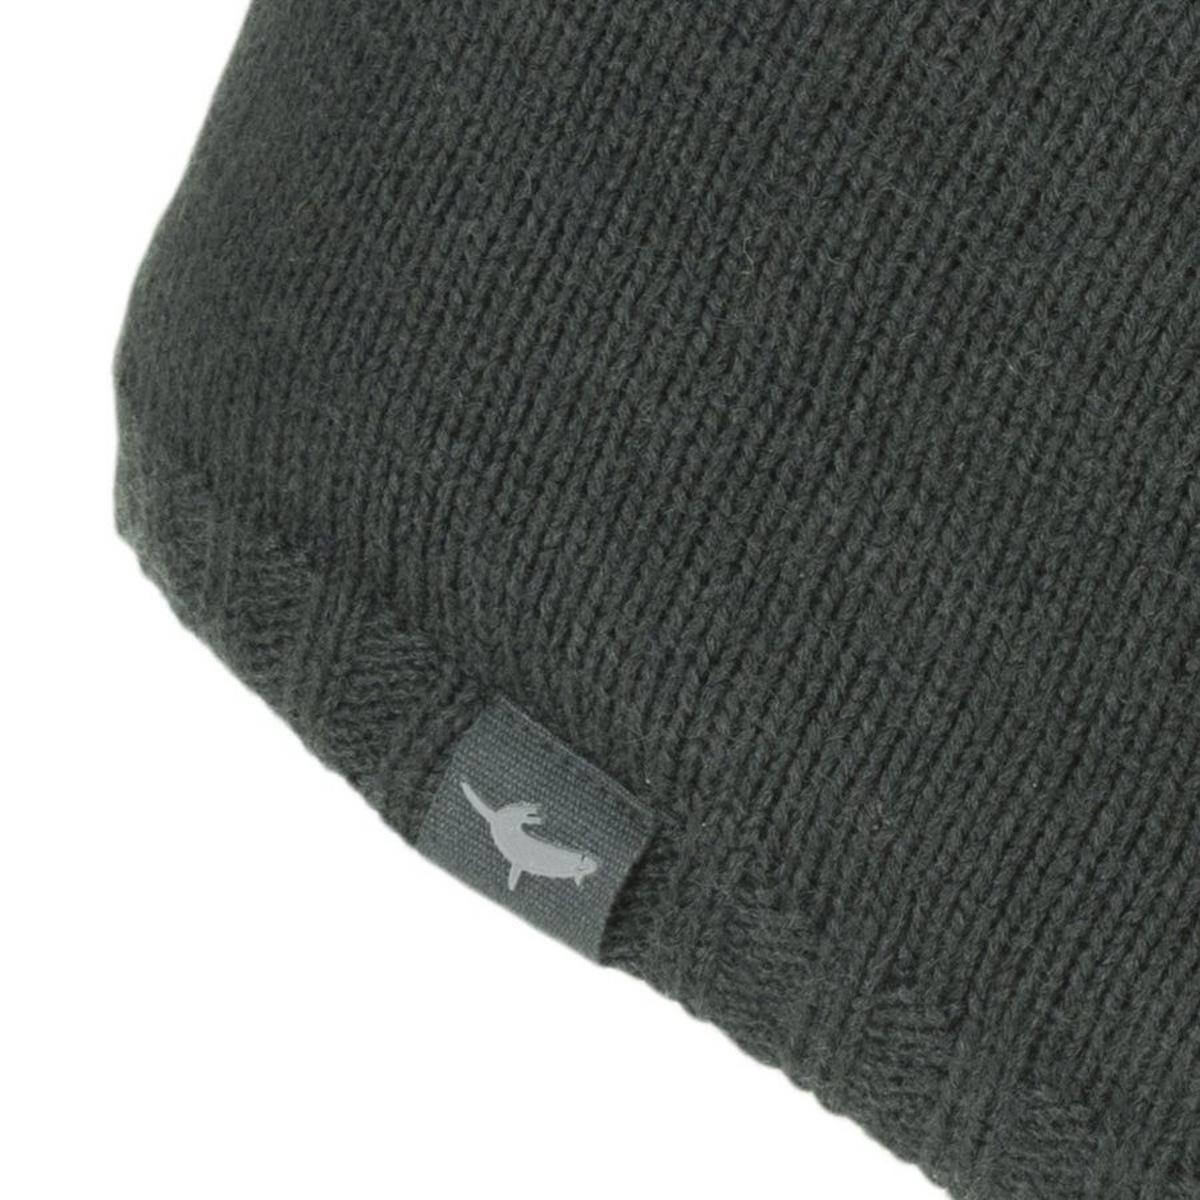 Sealskinz Unisex Sealskinz Waterproof Beanie Hat - Black